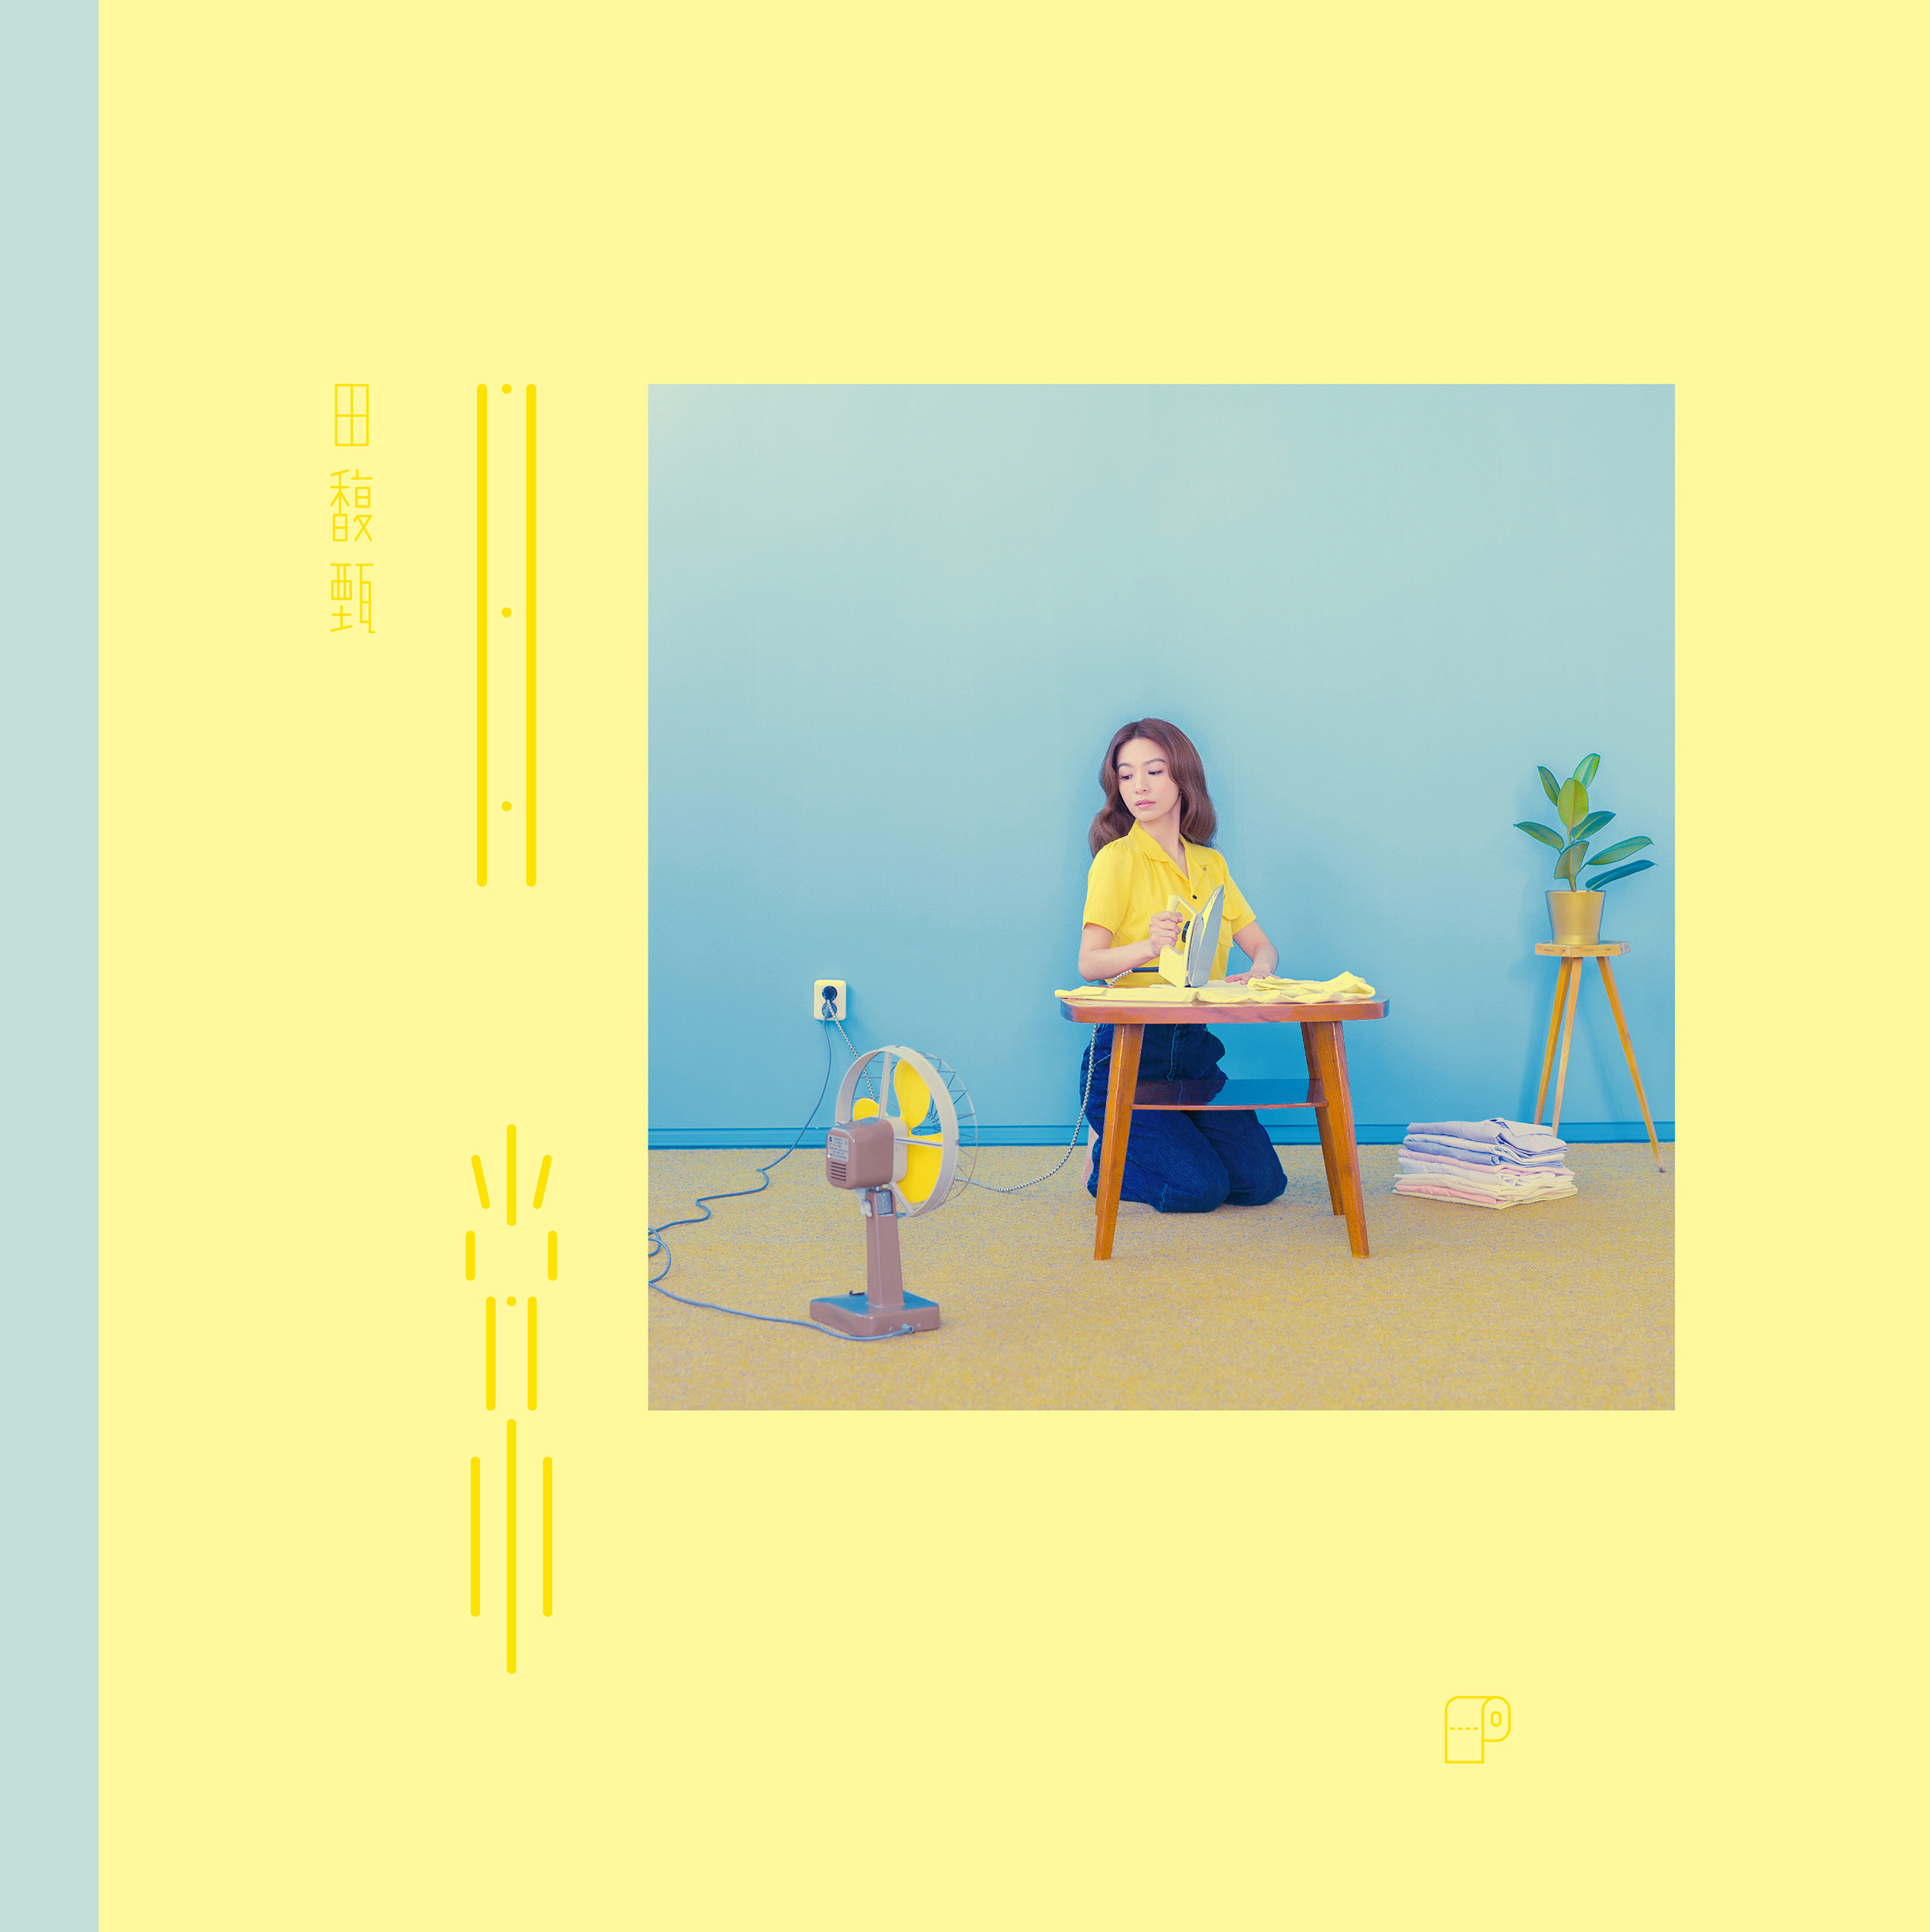 田馥甄 日常 Album Art Cover